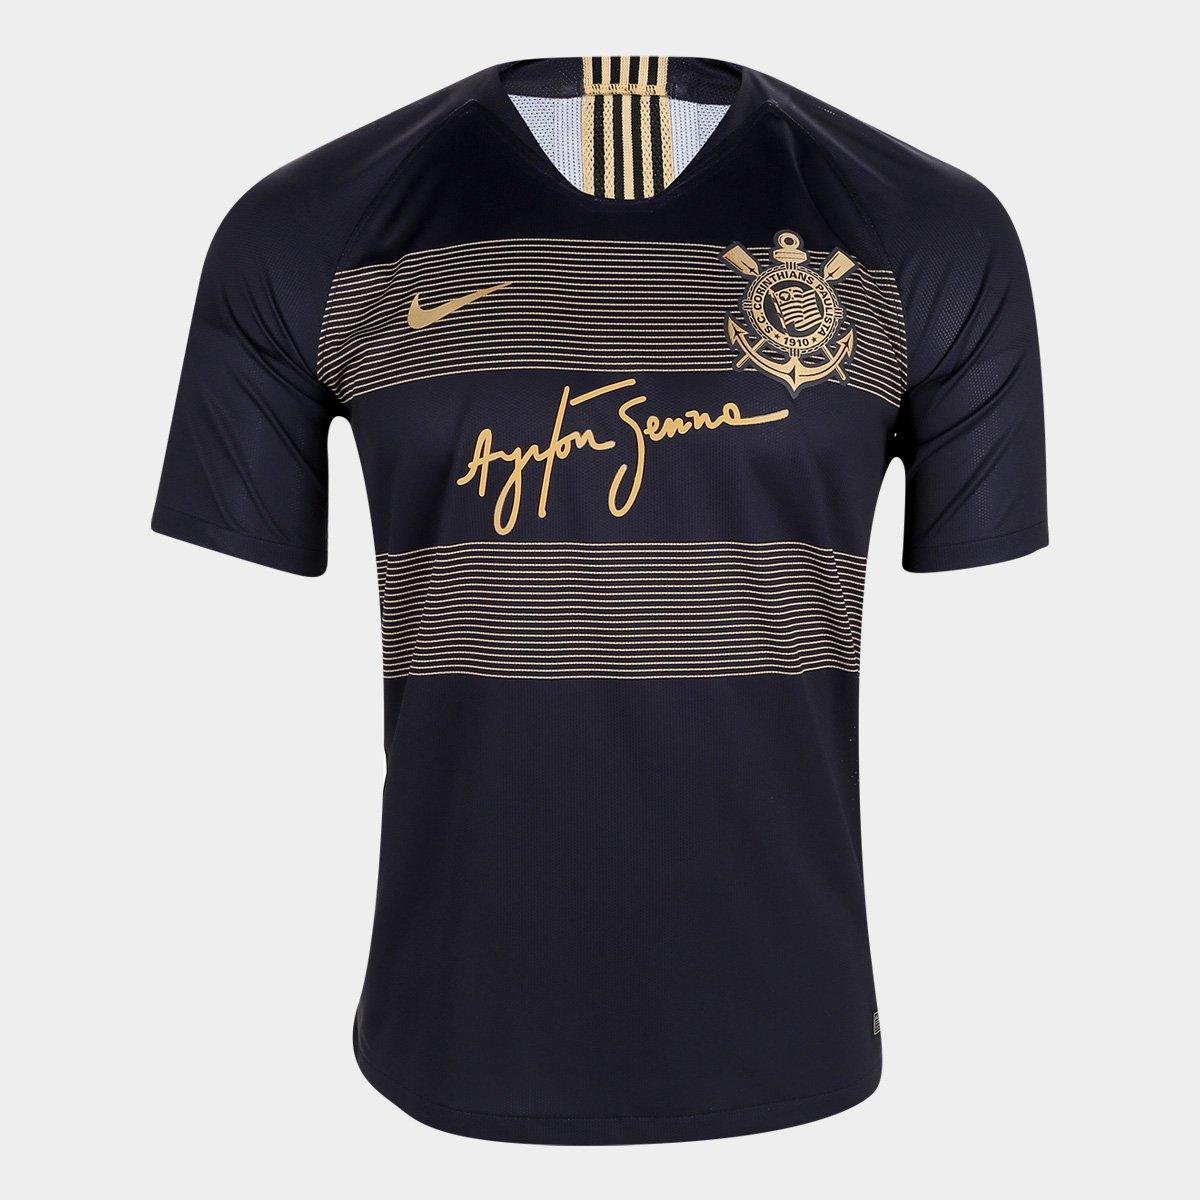 Camisa Corinthians III 2018 s n° - Jogador Nike Masculino - Preto+Dourado 8b232ed8b8bc9